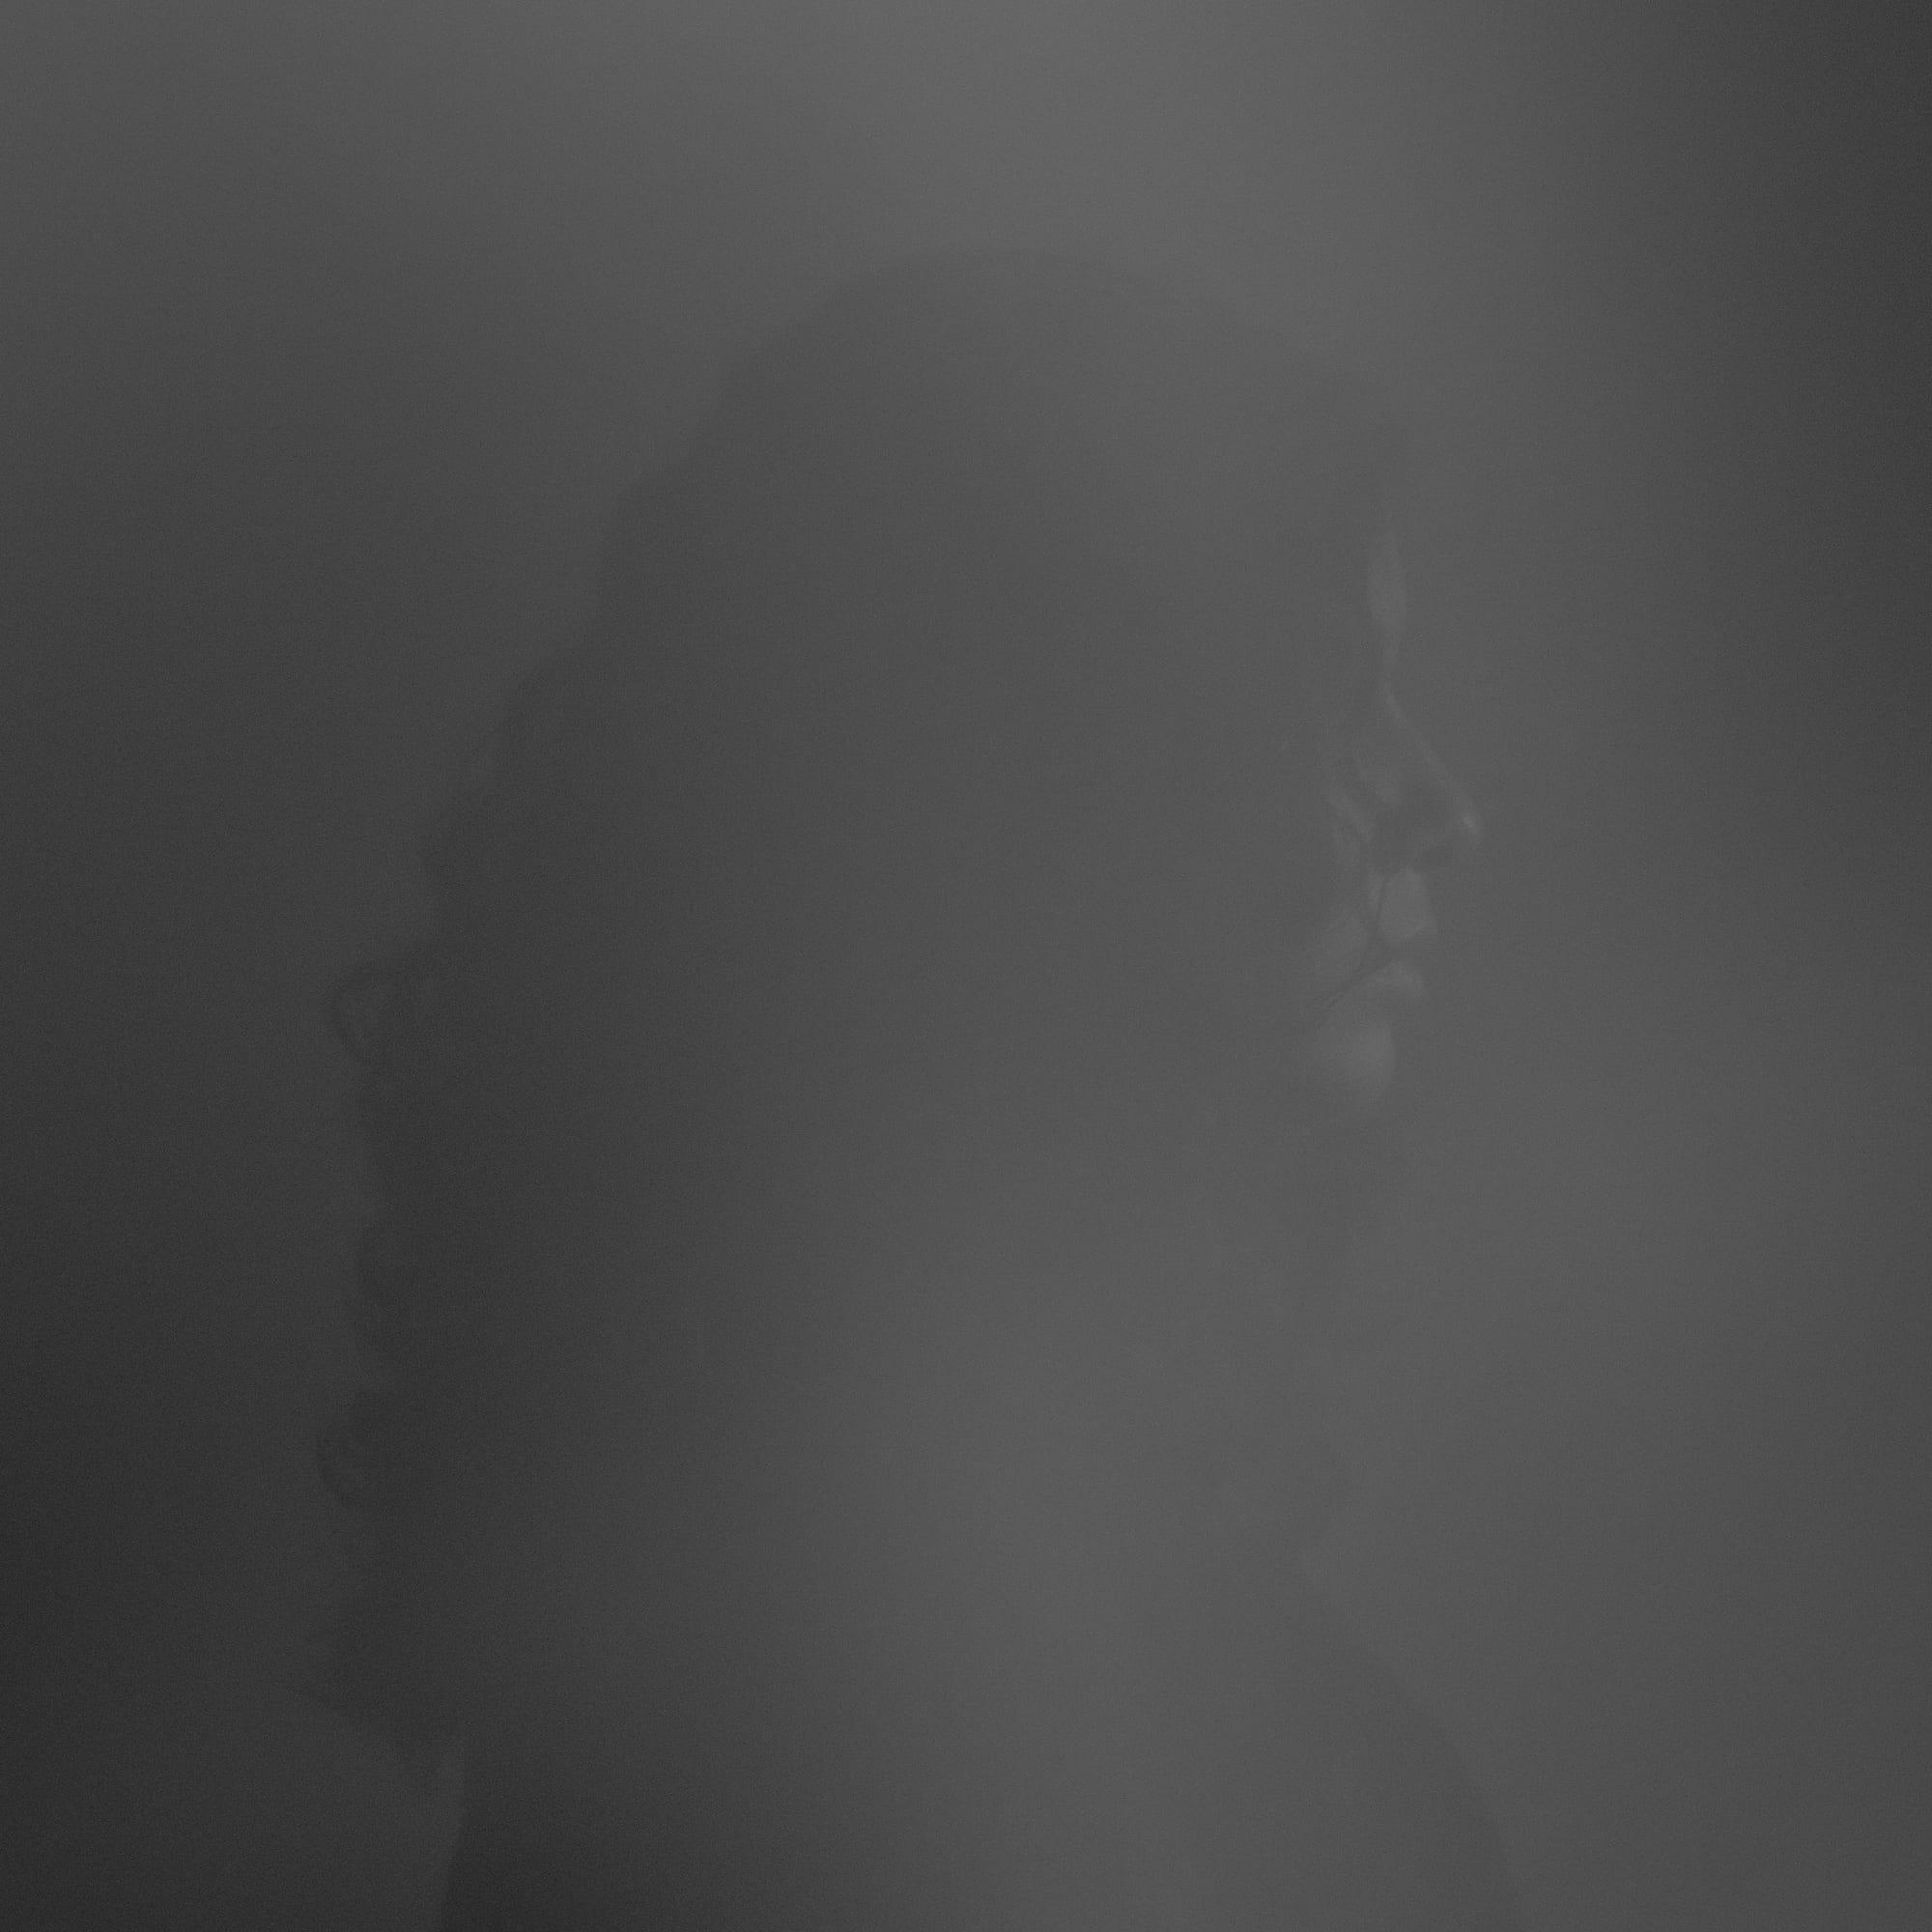 Sumi Anjuman Self Portrait